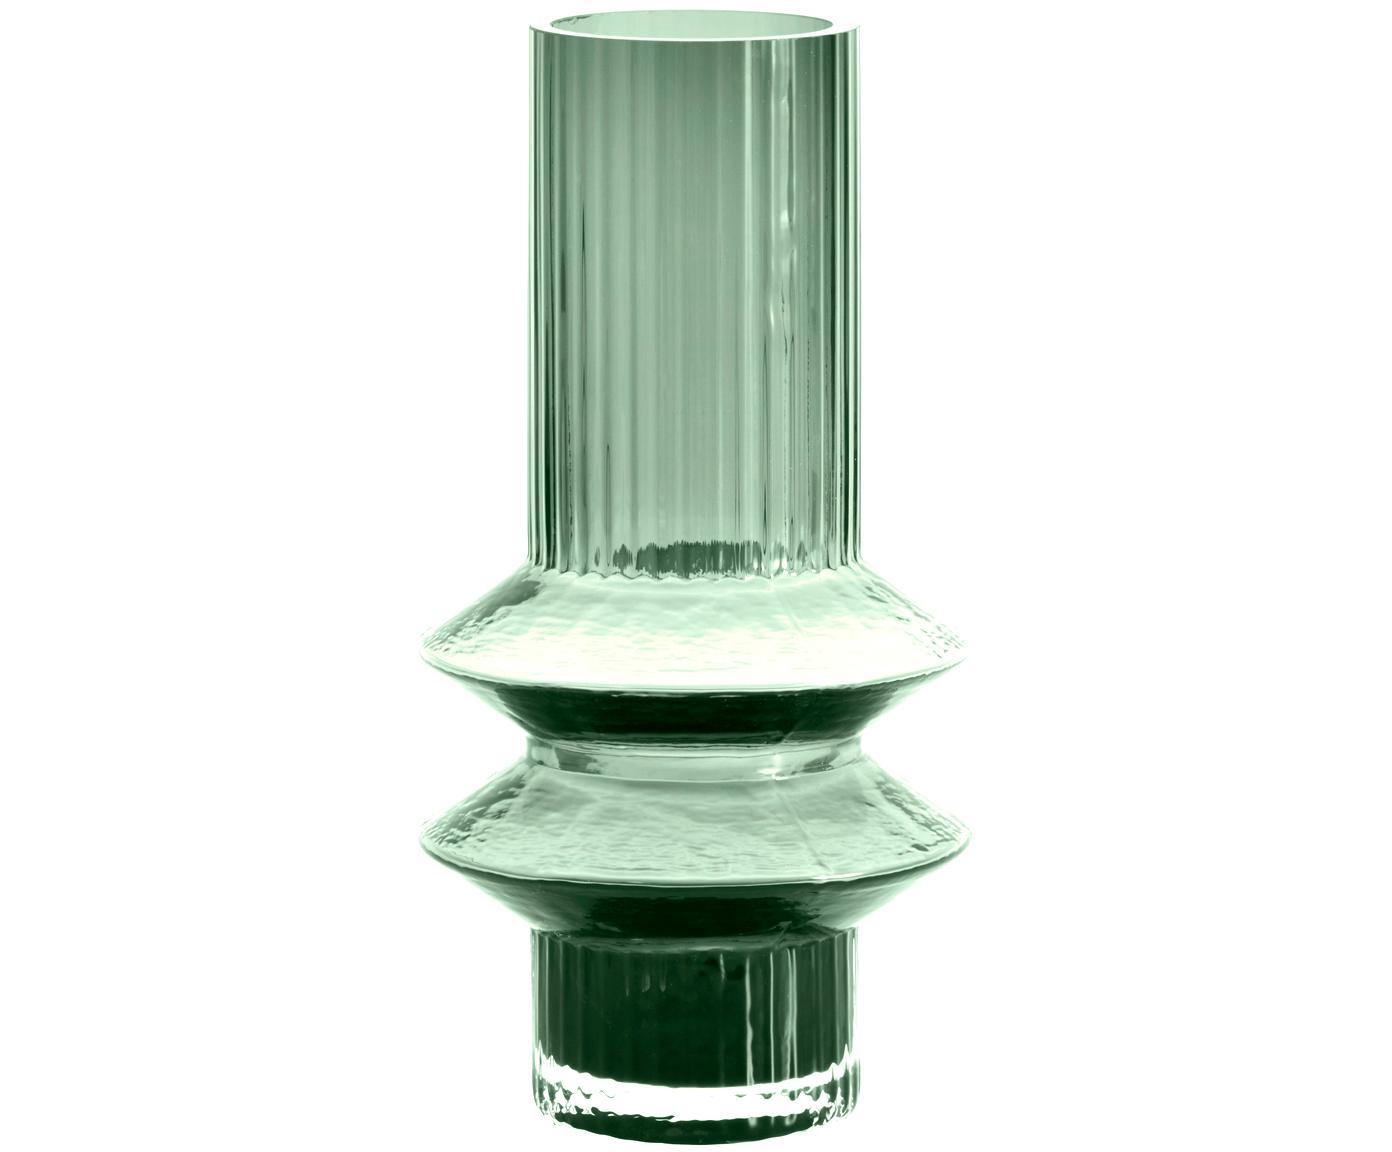 Glas-Vase Rilla, Glas, Grün, Ø 10 x H 21 cm